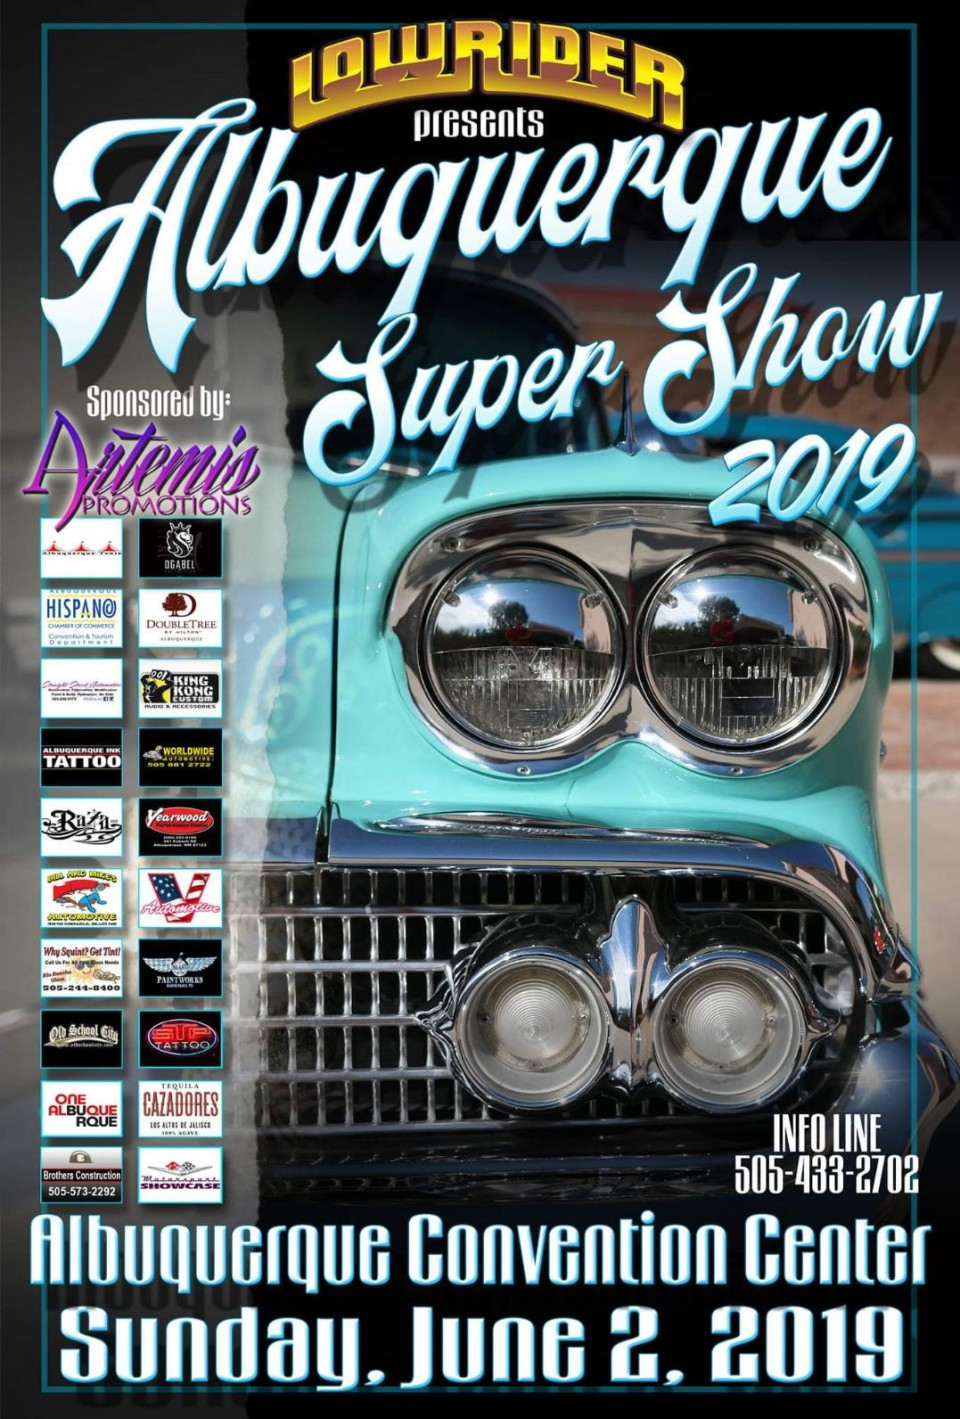 Up next...Albuquerque Super Show. Register now at https://motorsportshowcase.com/index.php/msblvd/events-calendar/viewevent/72-2019-albuquerque-super-show